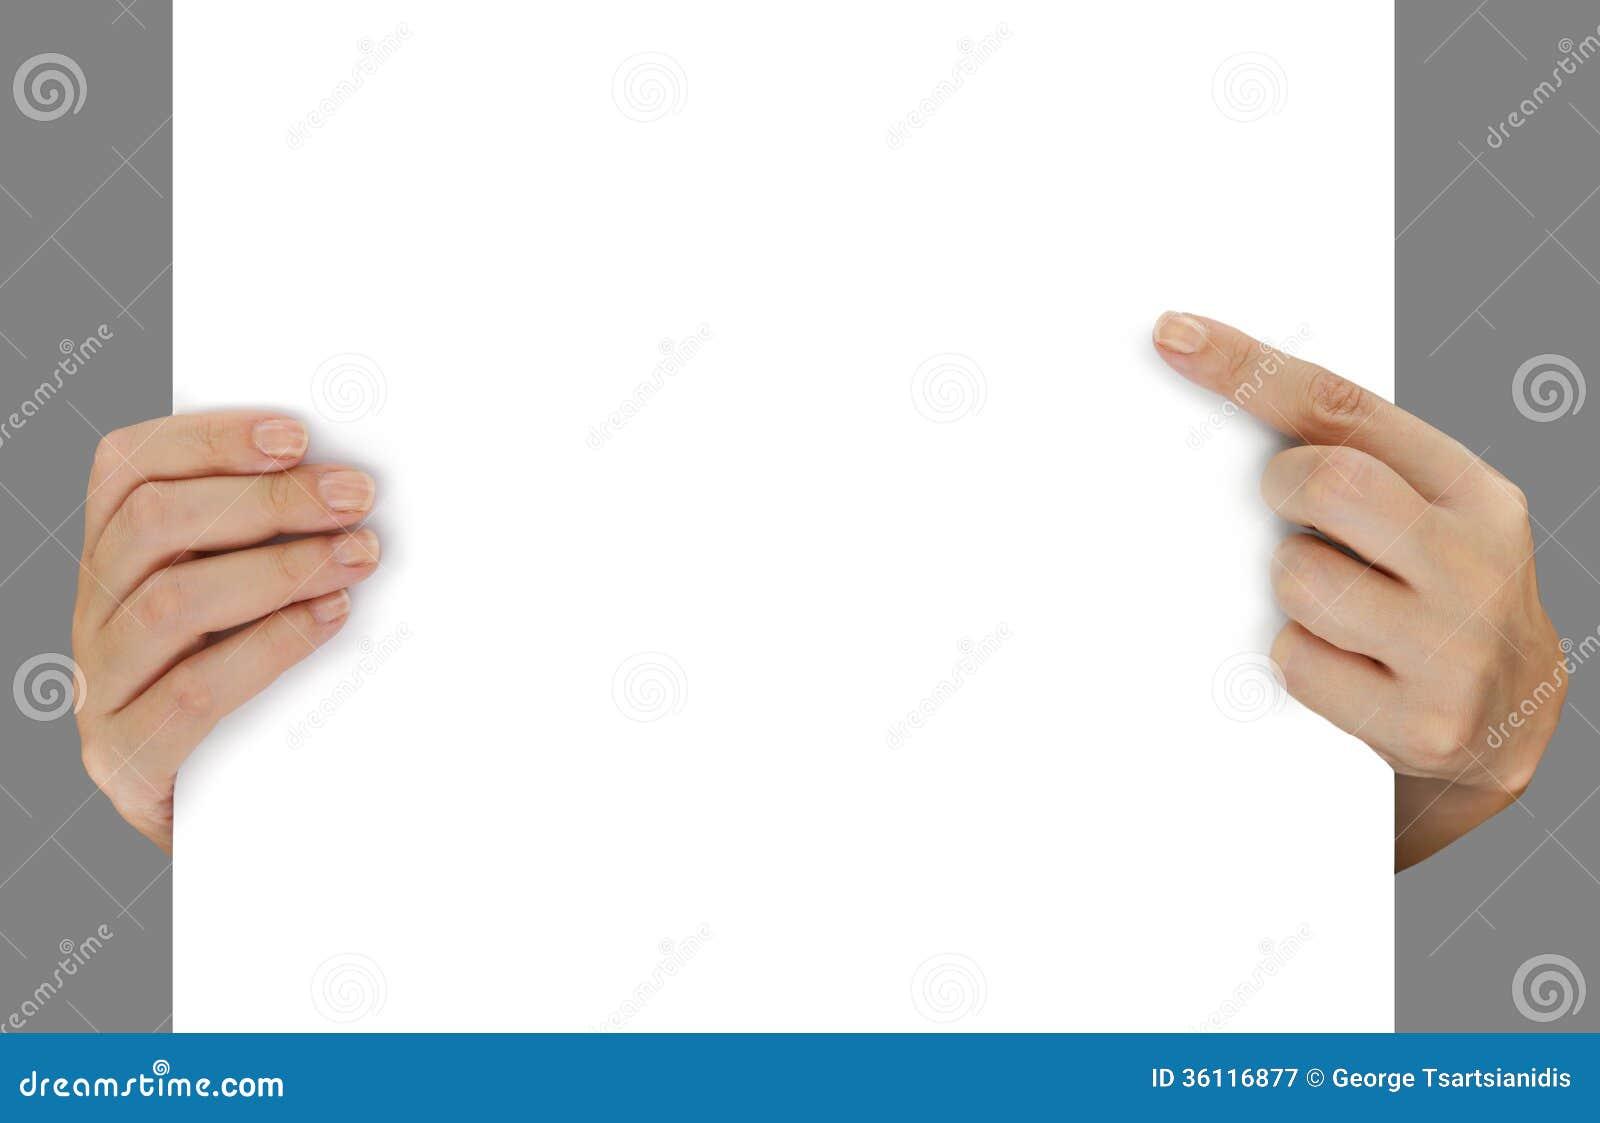 hands on essays